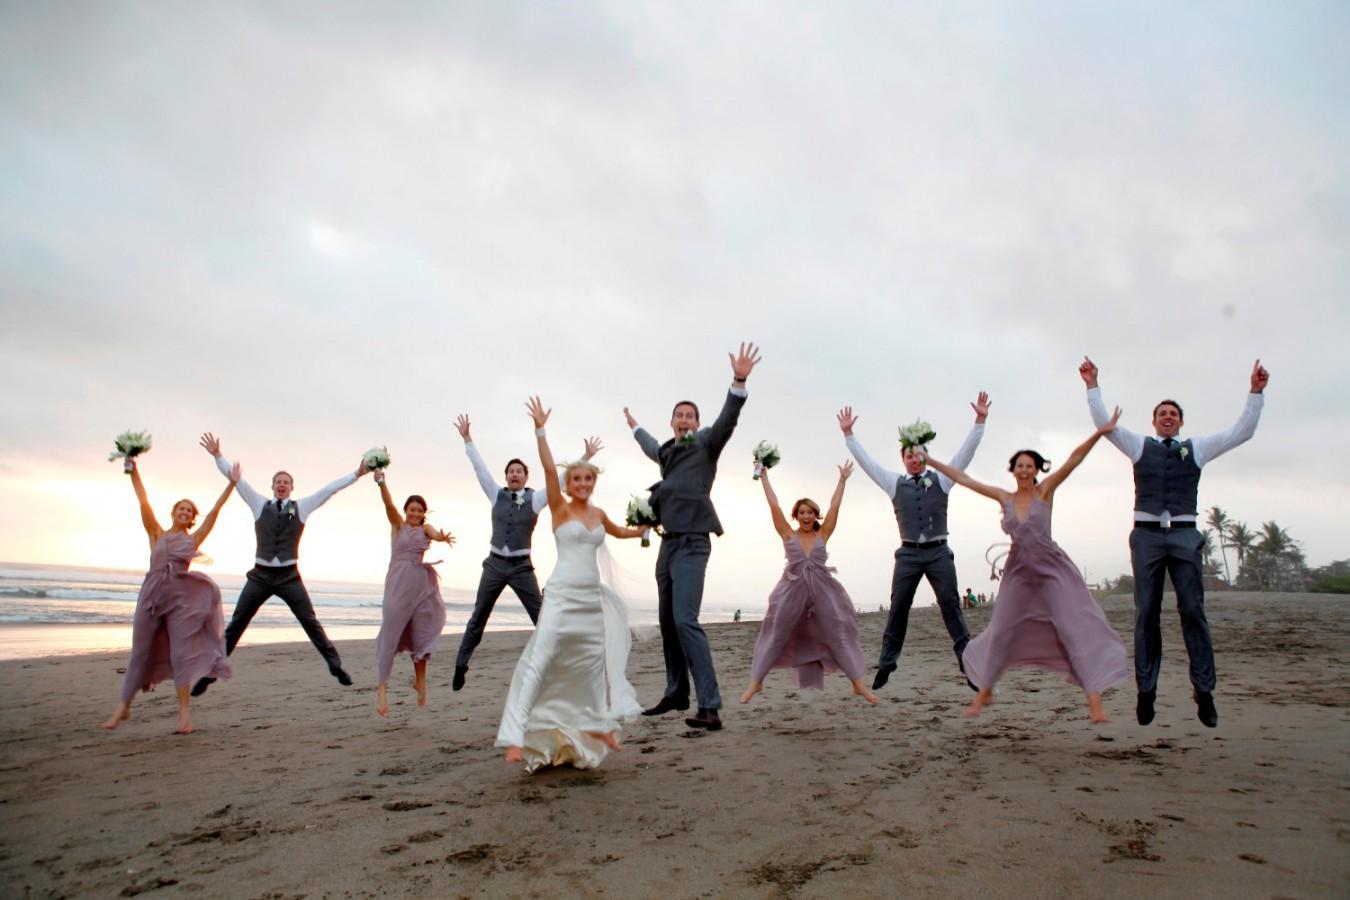 2011.10.16, Megann and Daniel, Ombak Luwung, MJY - Bali Wedding Paradise (24)